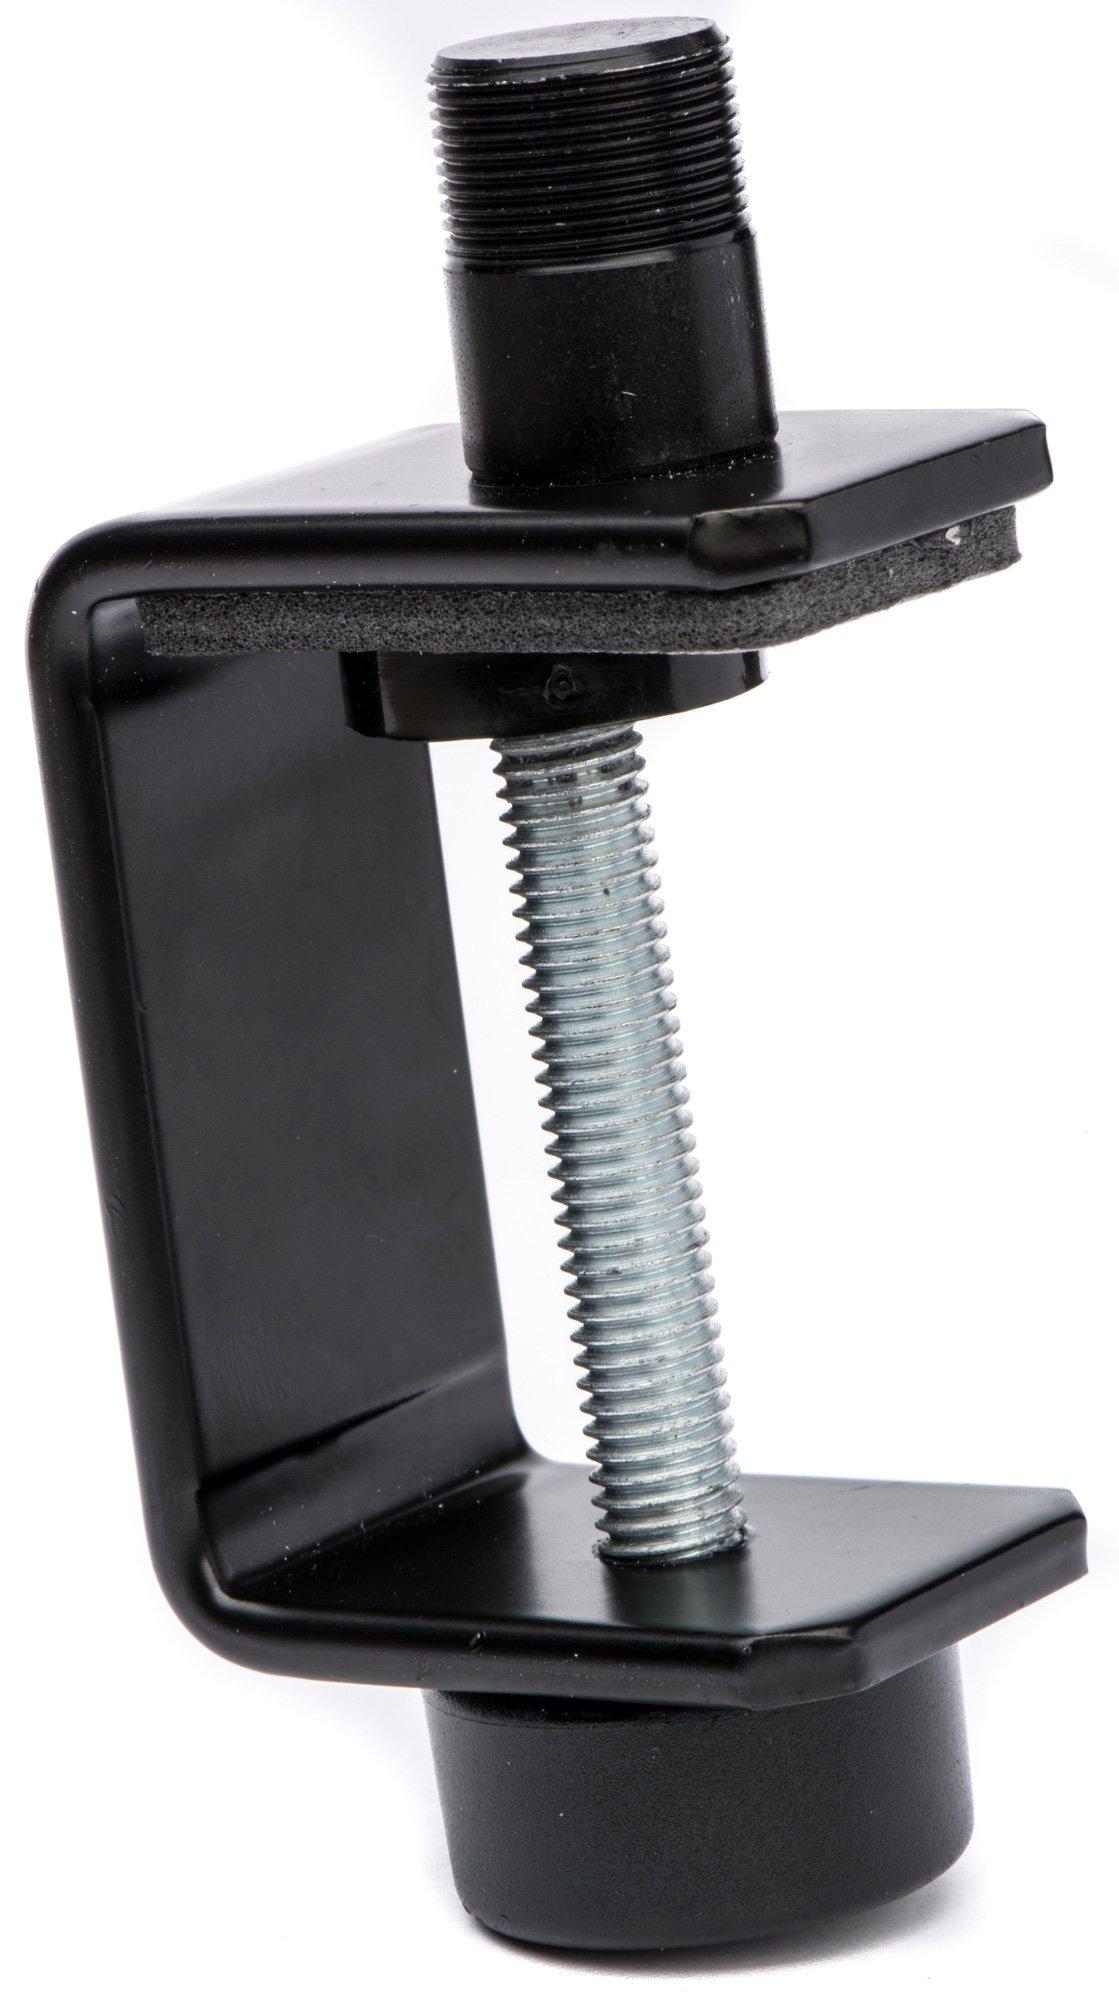 K&M 23700 Table Mic Clamp - Black MS-237